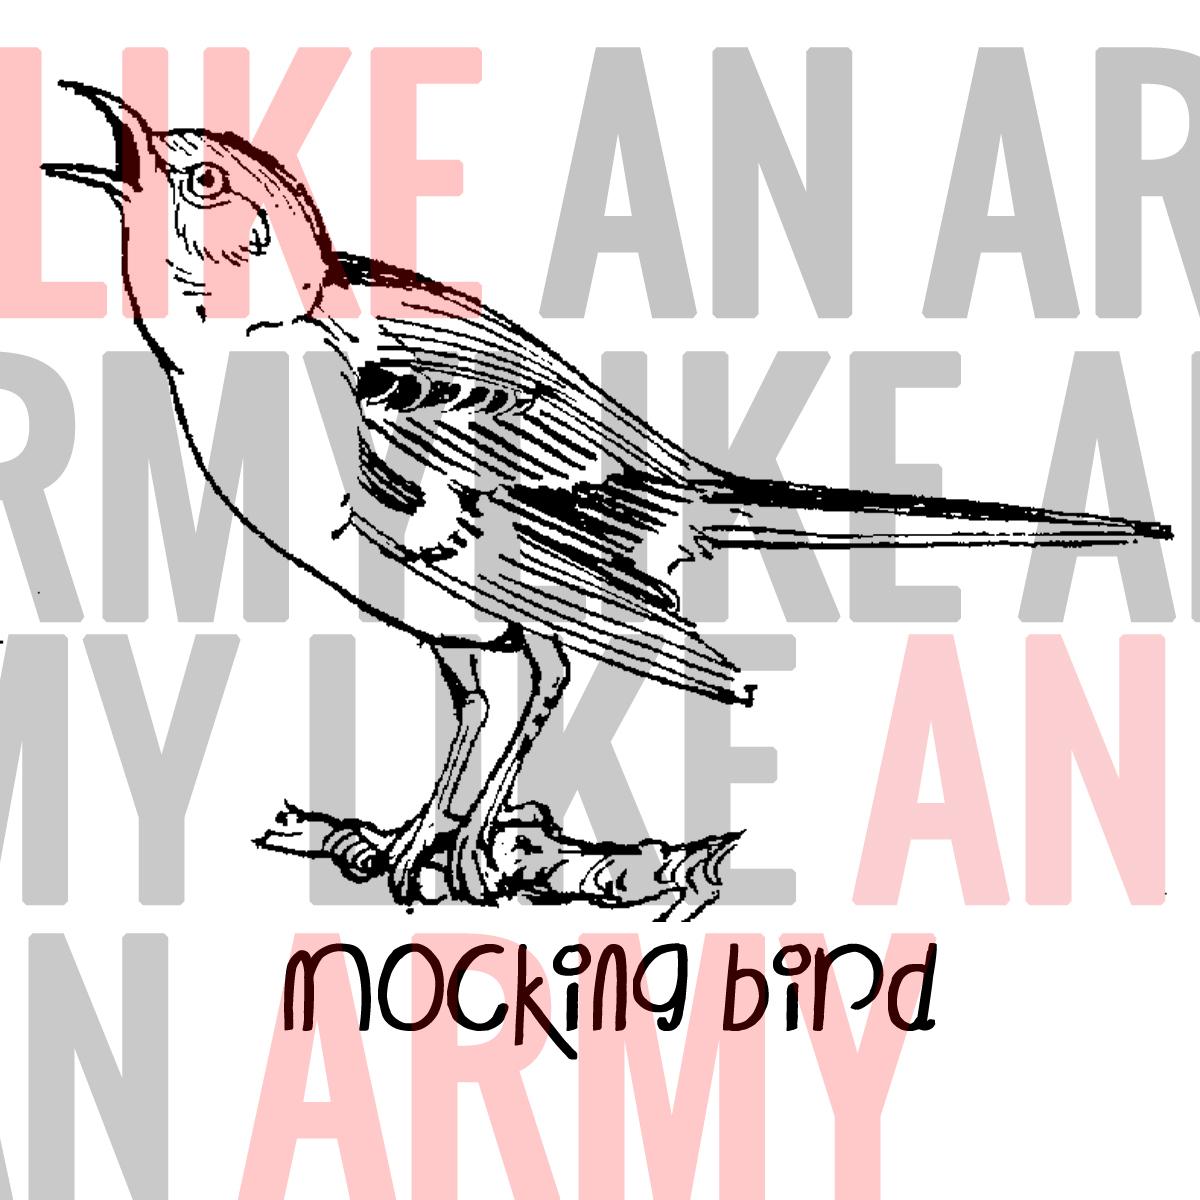 MOCKING BIRD SINGLE.jpg